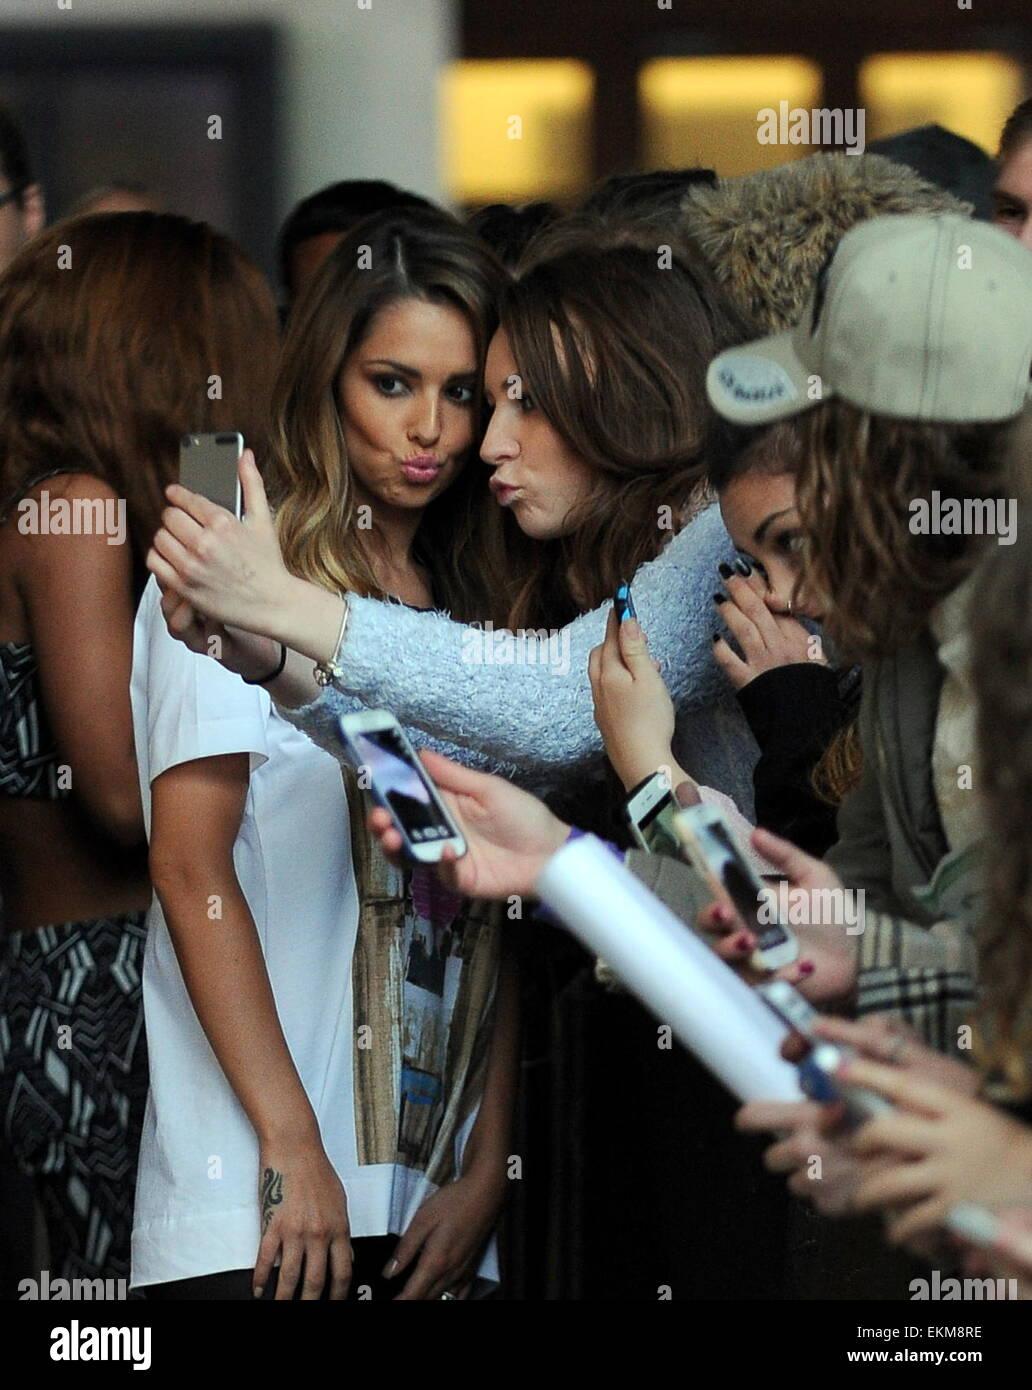 981988187f164b Cheryl and X Factor Finalists at Radio One Featuring  Cheryl  Fernandez-Versini, Cheryl